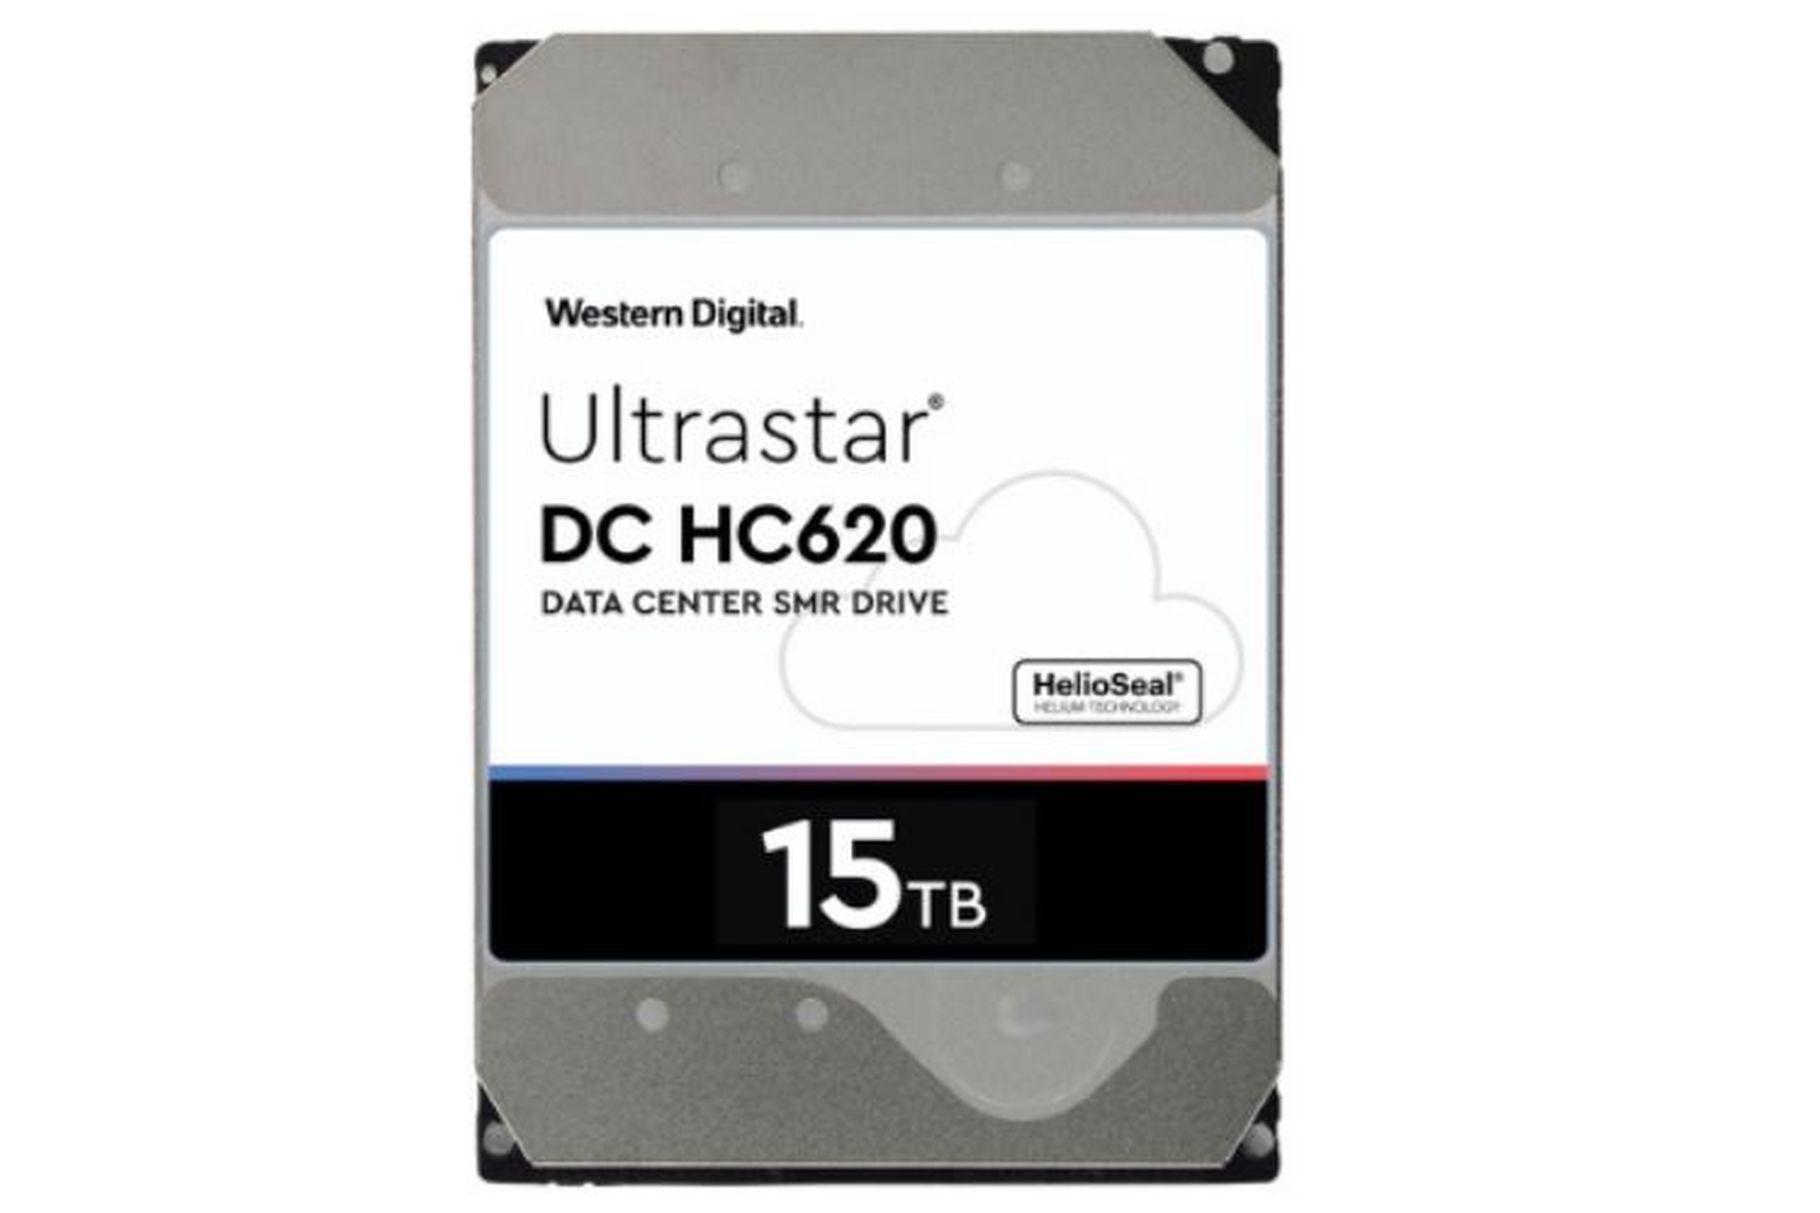 WD Ultrastar DC HC620 15 TB